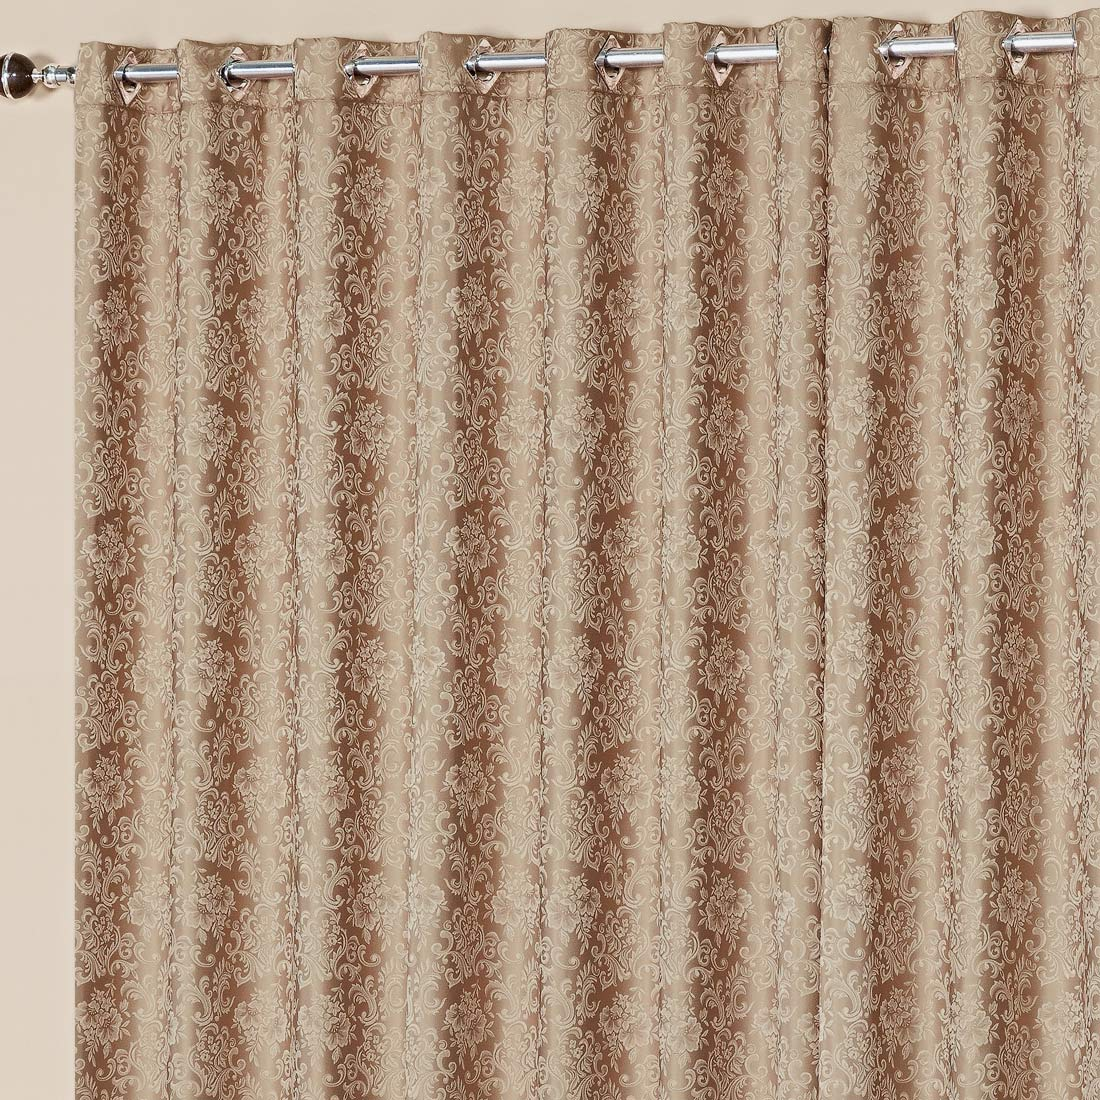 Cortina Nobre Jacquard Bege 3,00m x 2,50m p/ Varão Simples